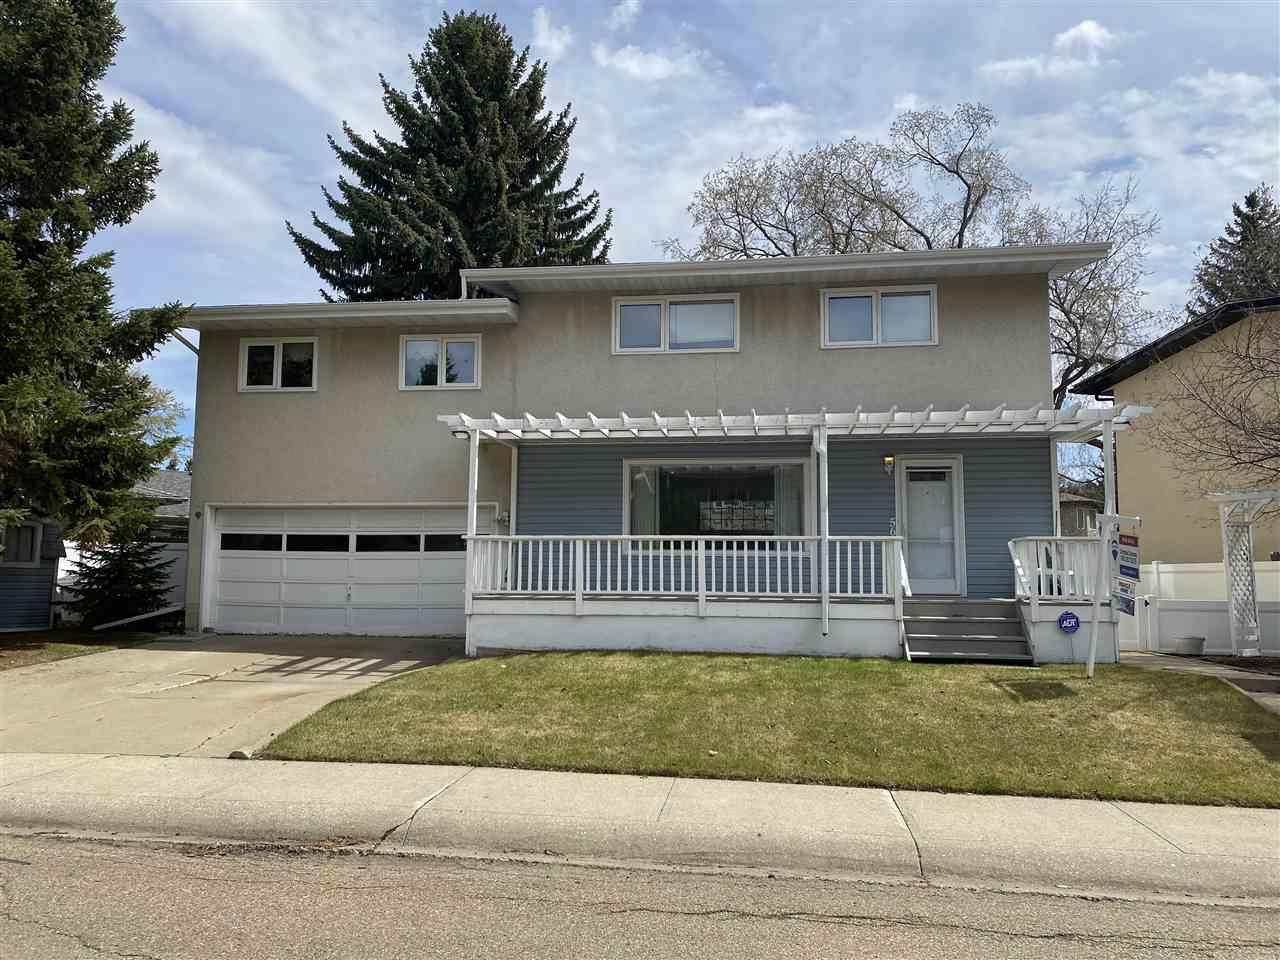 Main Photo: 5603 108 Street in Edmonton: Zone 15 House for sale : MLS®# E4205737